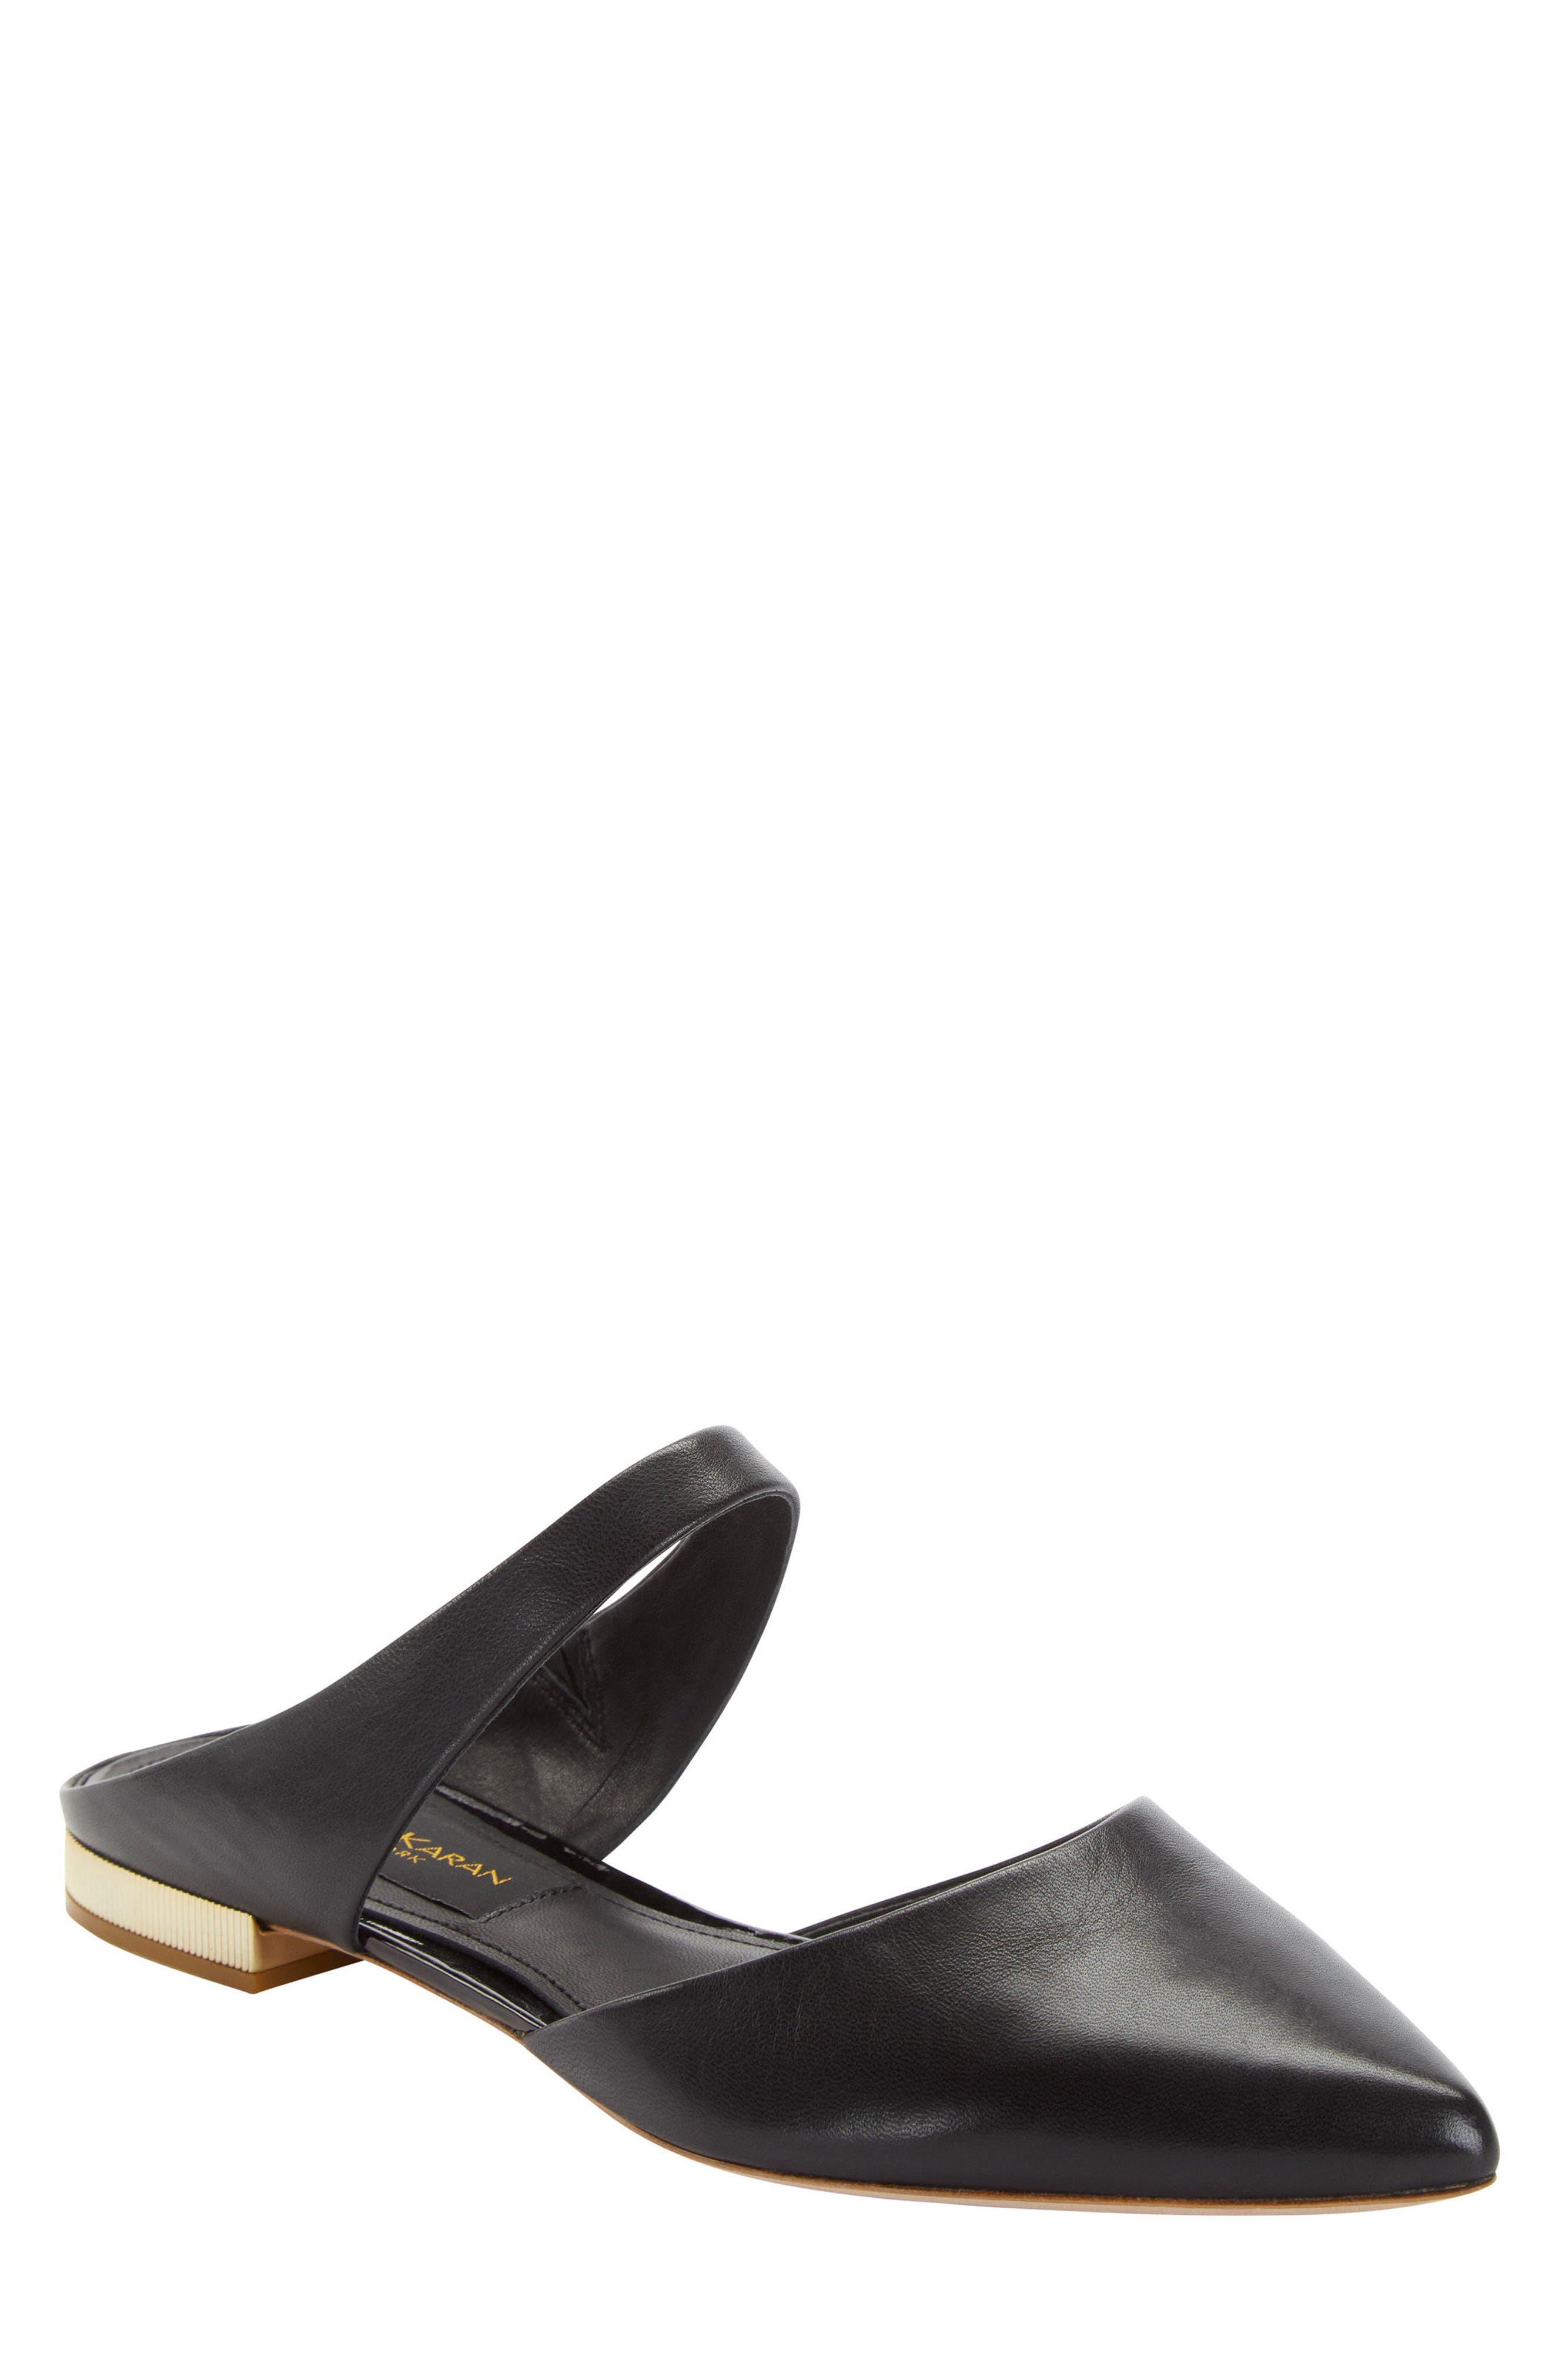 Donna Karan Paris Pointy Toe Mule,                             Main thumbnail 1, color,                             Black Leather